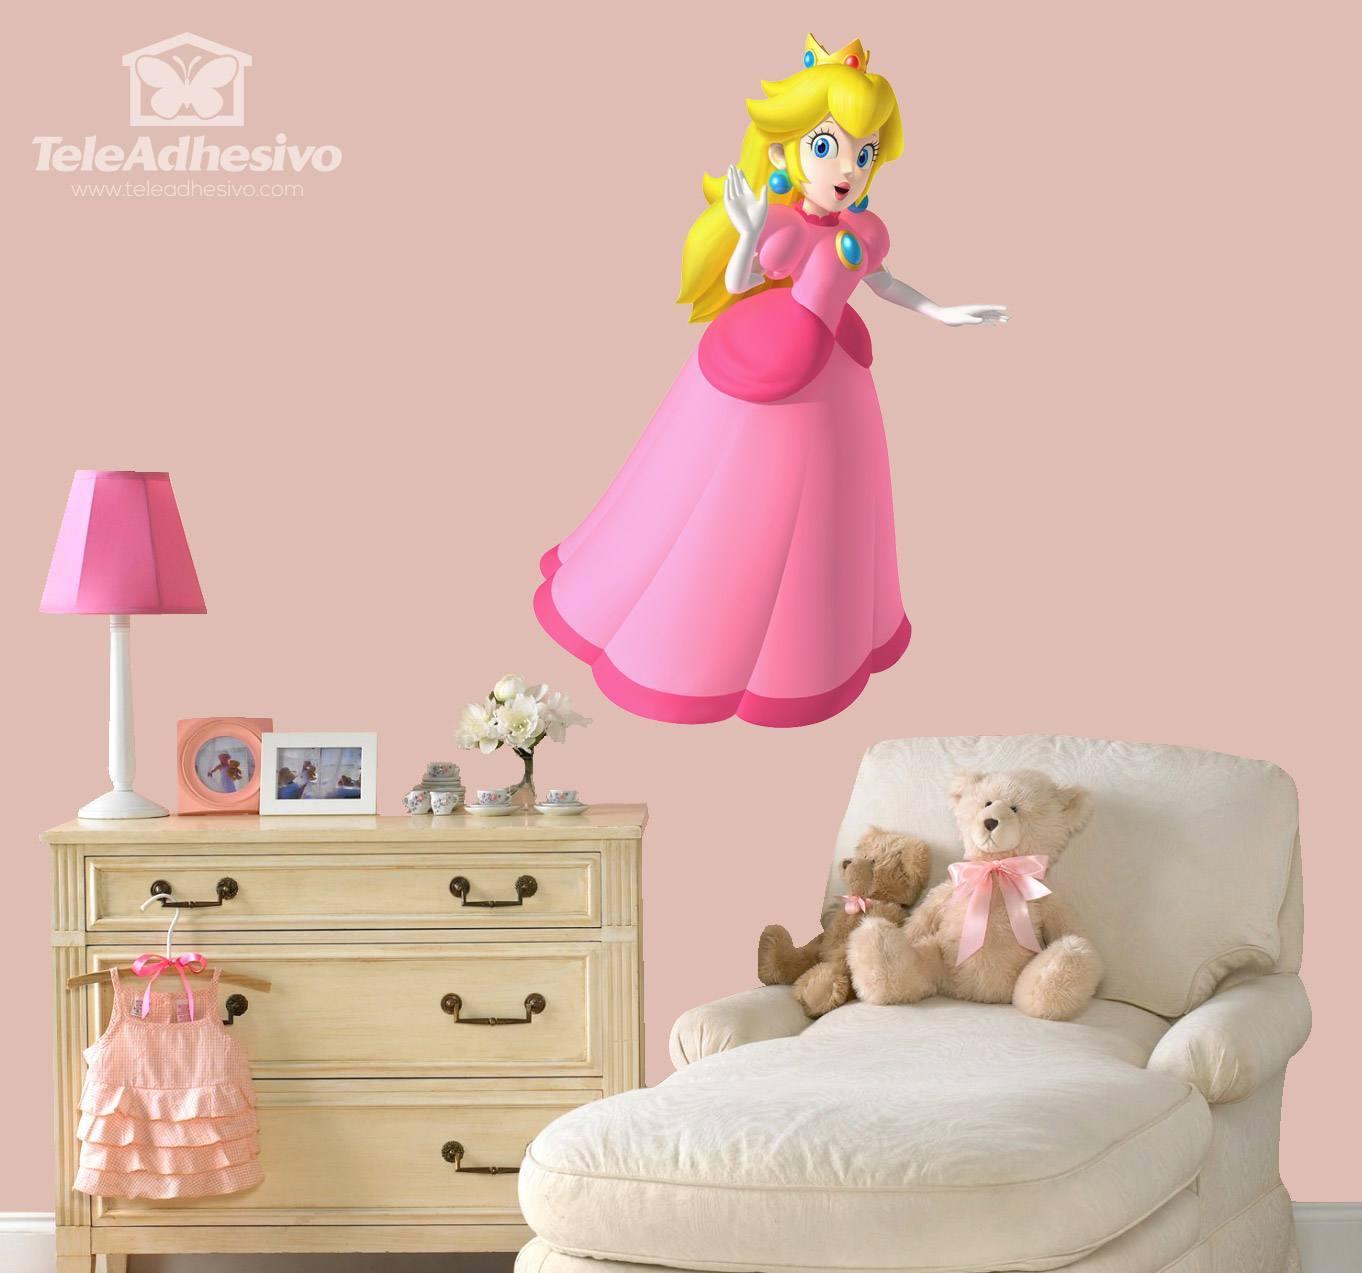 Kinderzimmer Wandtattoo: Princess Peach 2